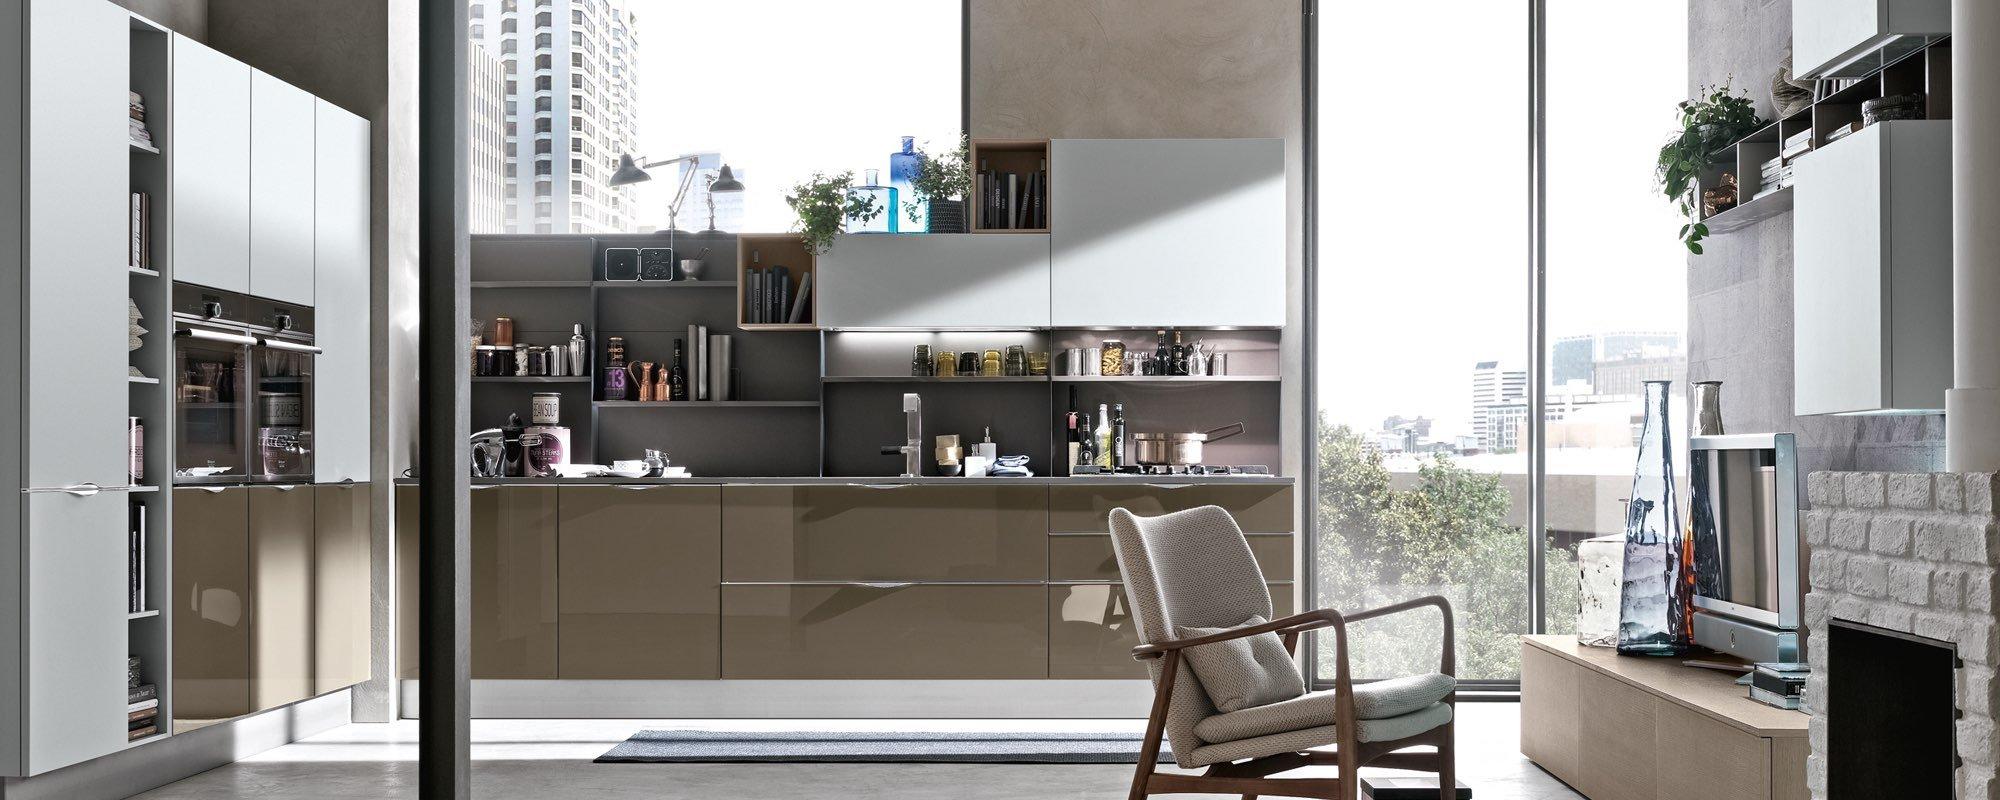 cucina moderna in legno laccata lucida - ALEVE